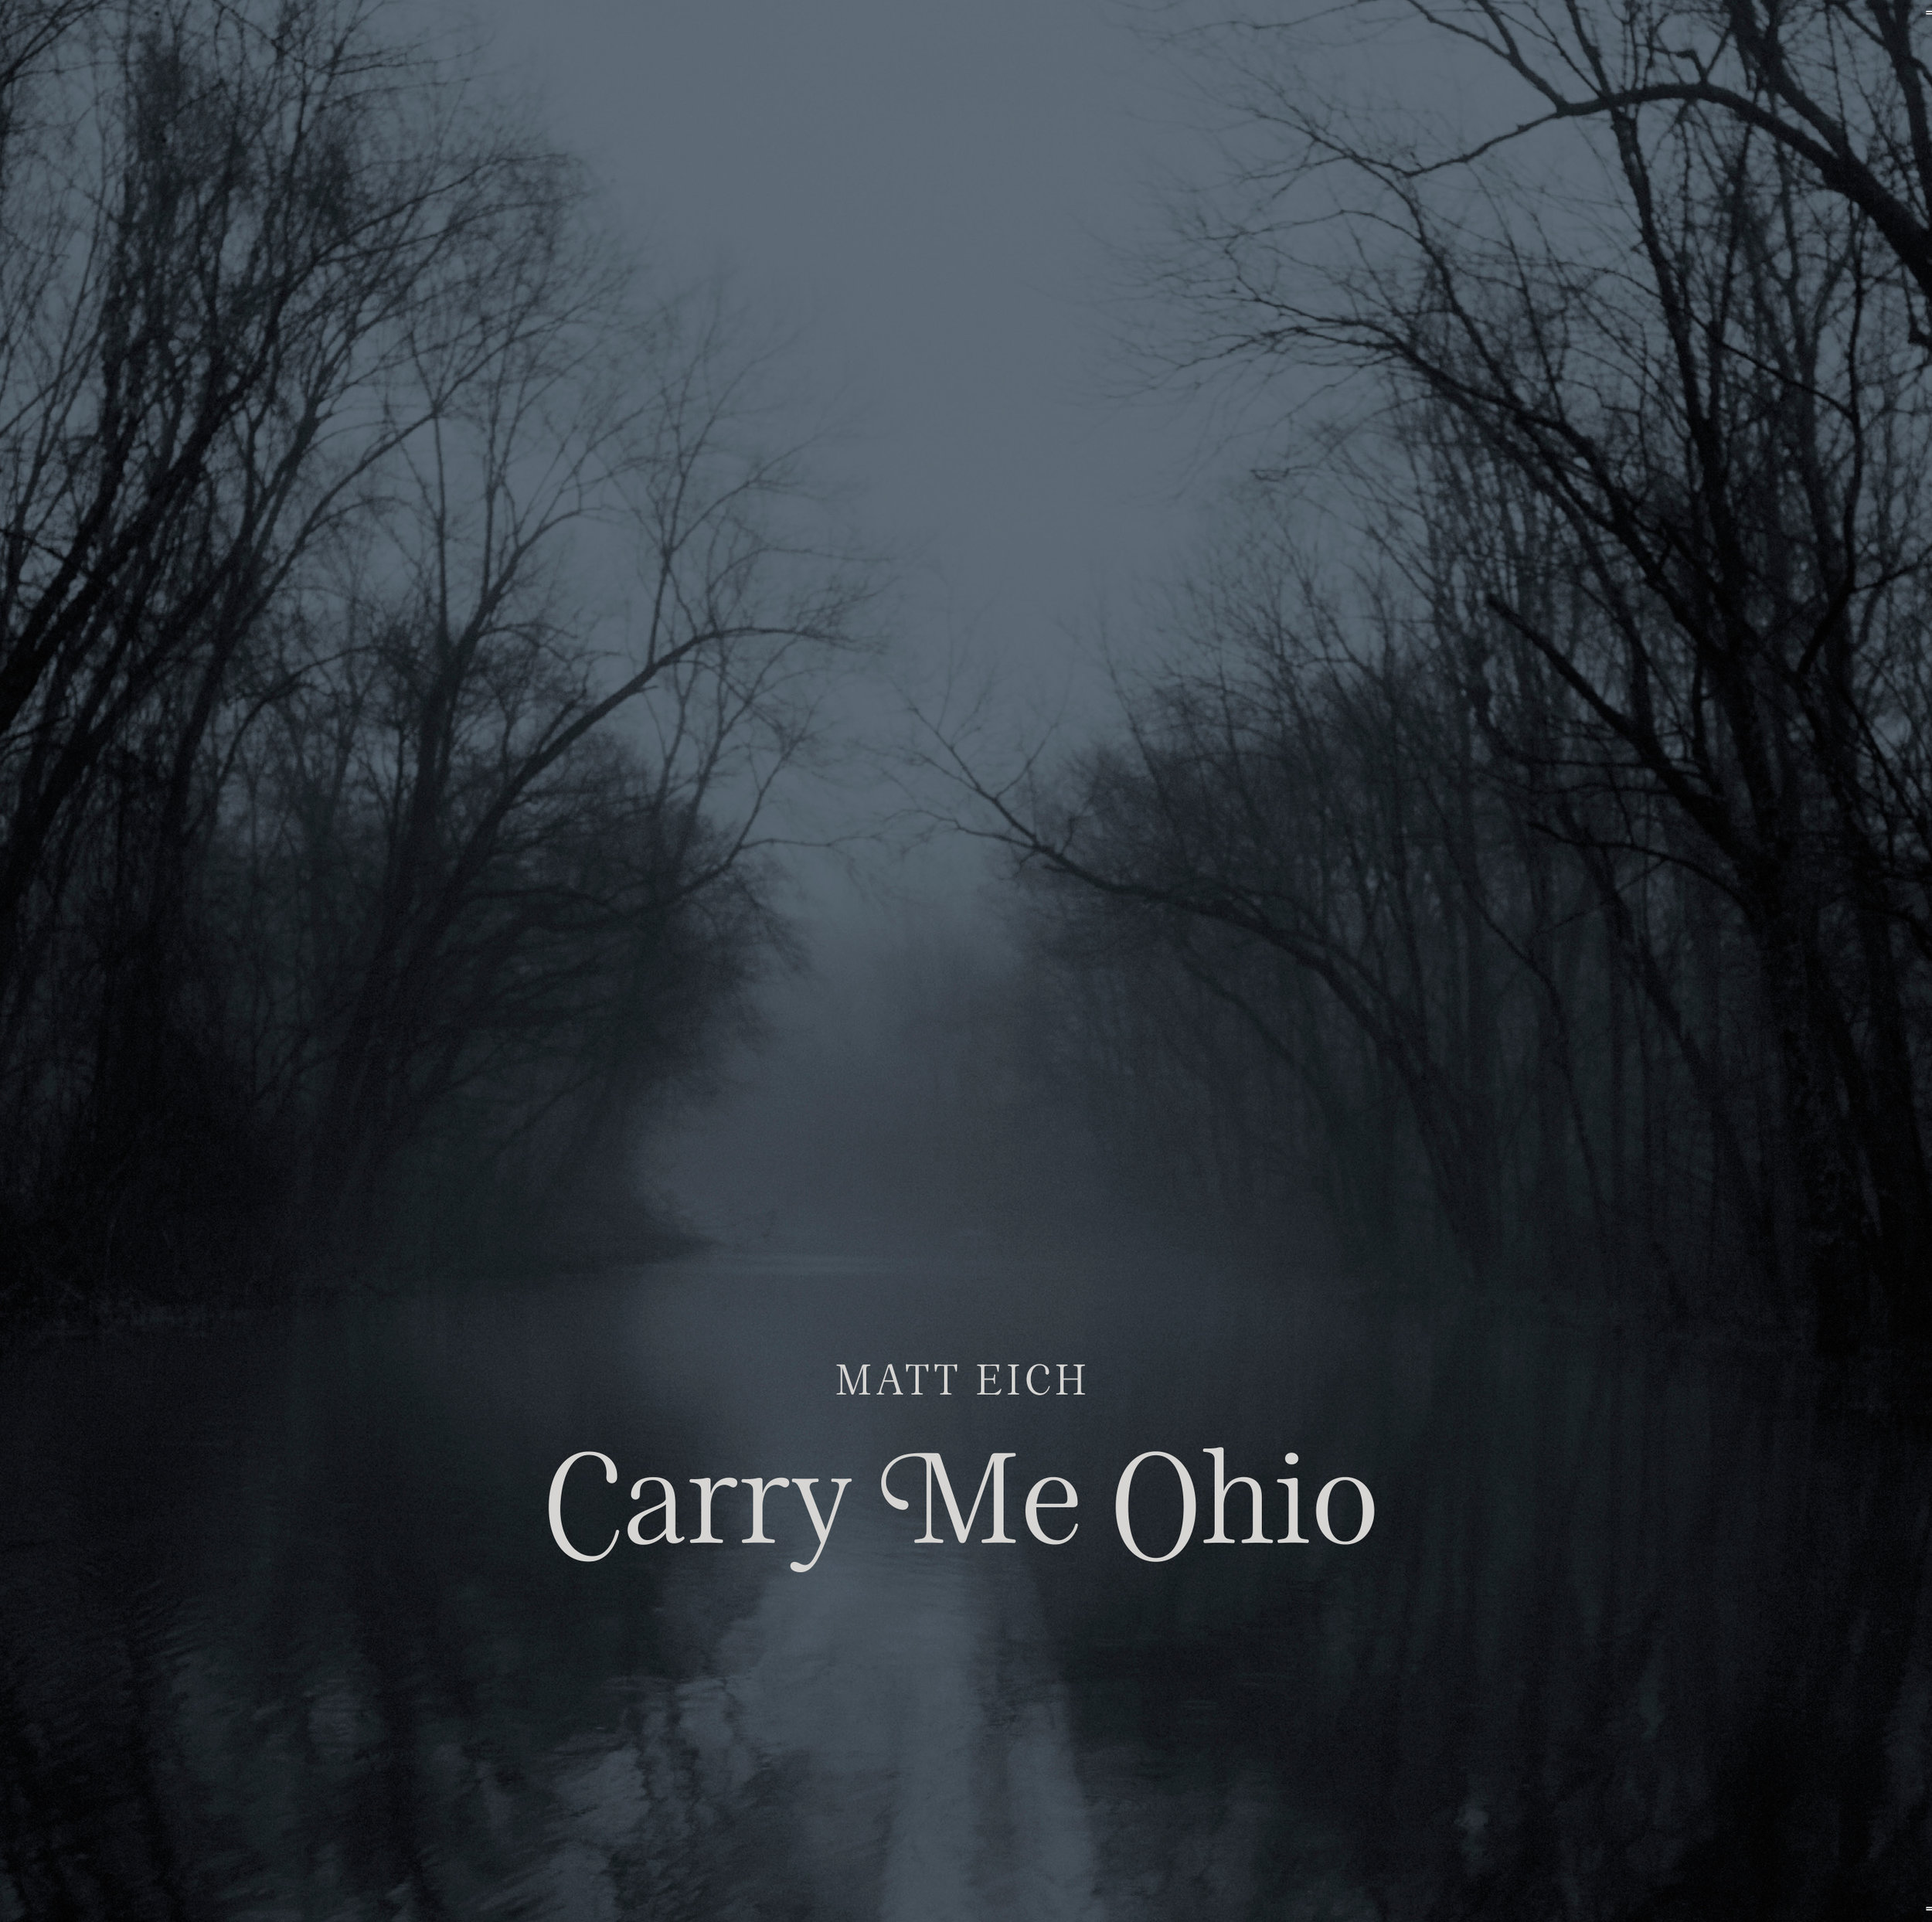 Carry Me Ohio (monograph) | Publisher: Sturm & Drang | Run: 600 copies